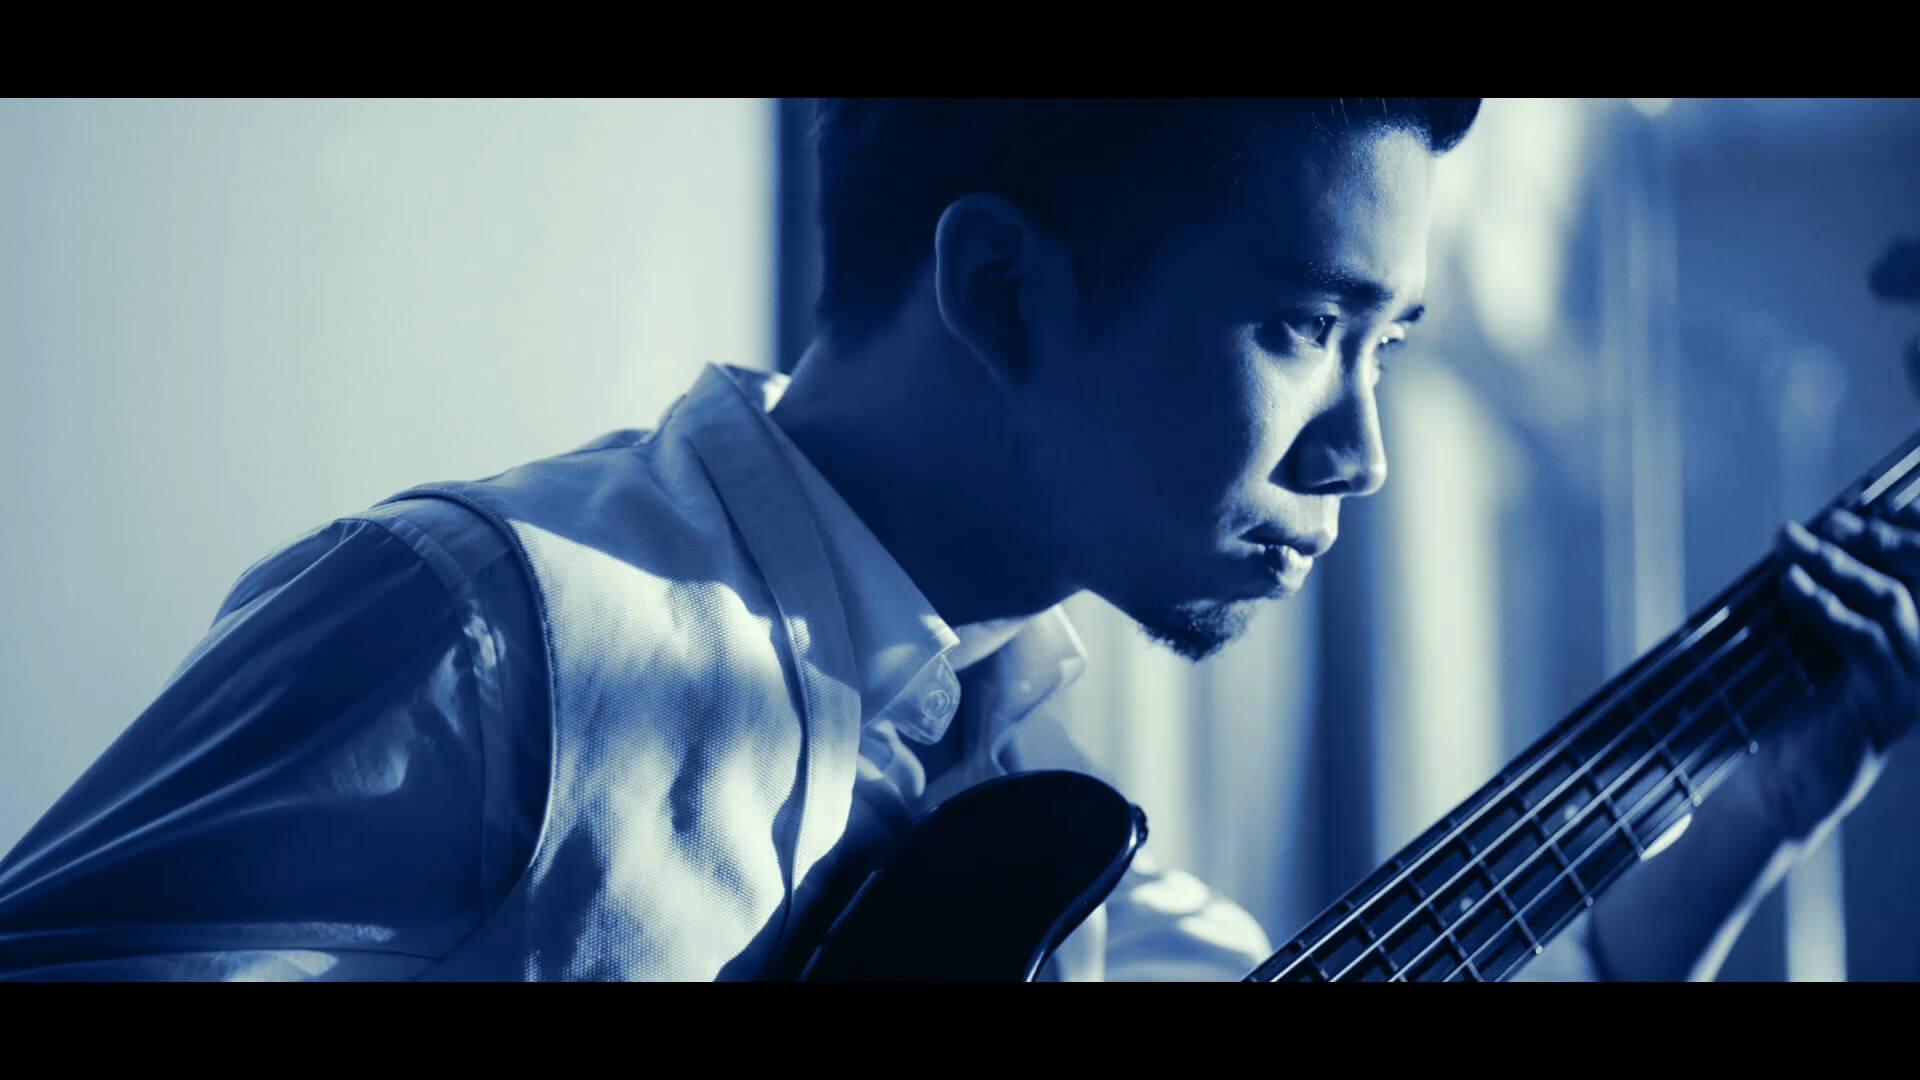 King Gnu、ソニーの完全ワイヤレス型ノイキャンイヤホン『WF-1000XM3』の新CMに出演 CMソングに「Teenager Forever」を初音源化 music191001_kinggnu_cm_2